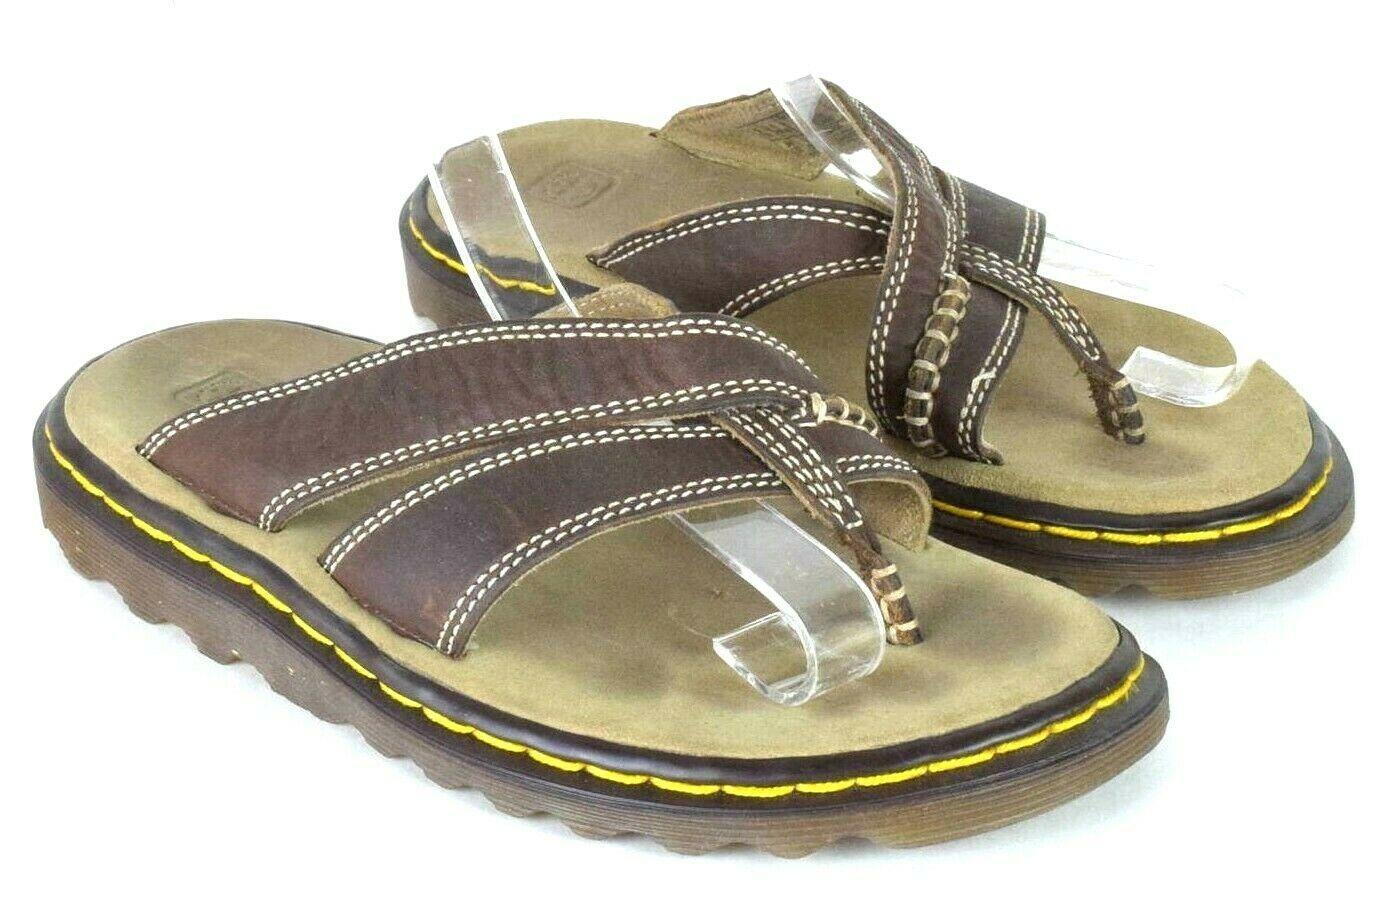 20d3d176e64c Dr Martens Brown Leather Slide Sandals Thong Flip Flops Womens Size US 5 UK  3